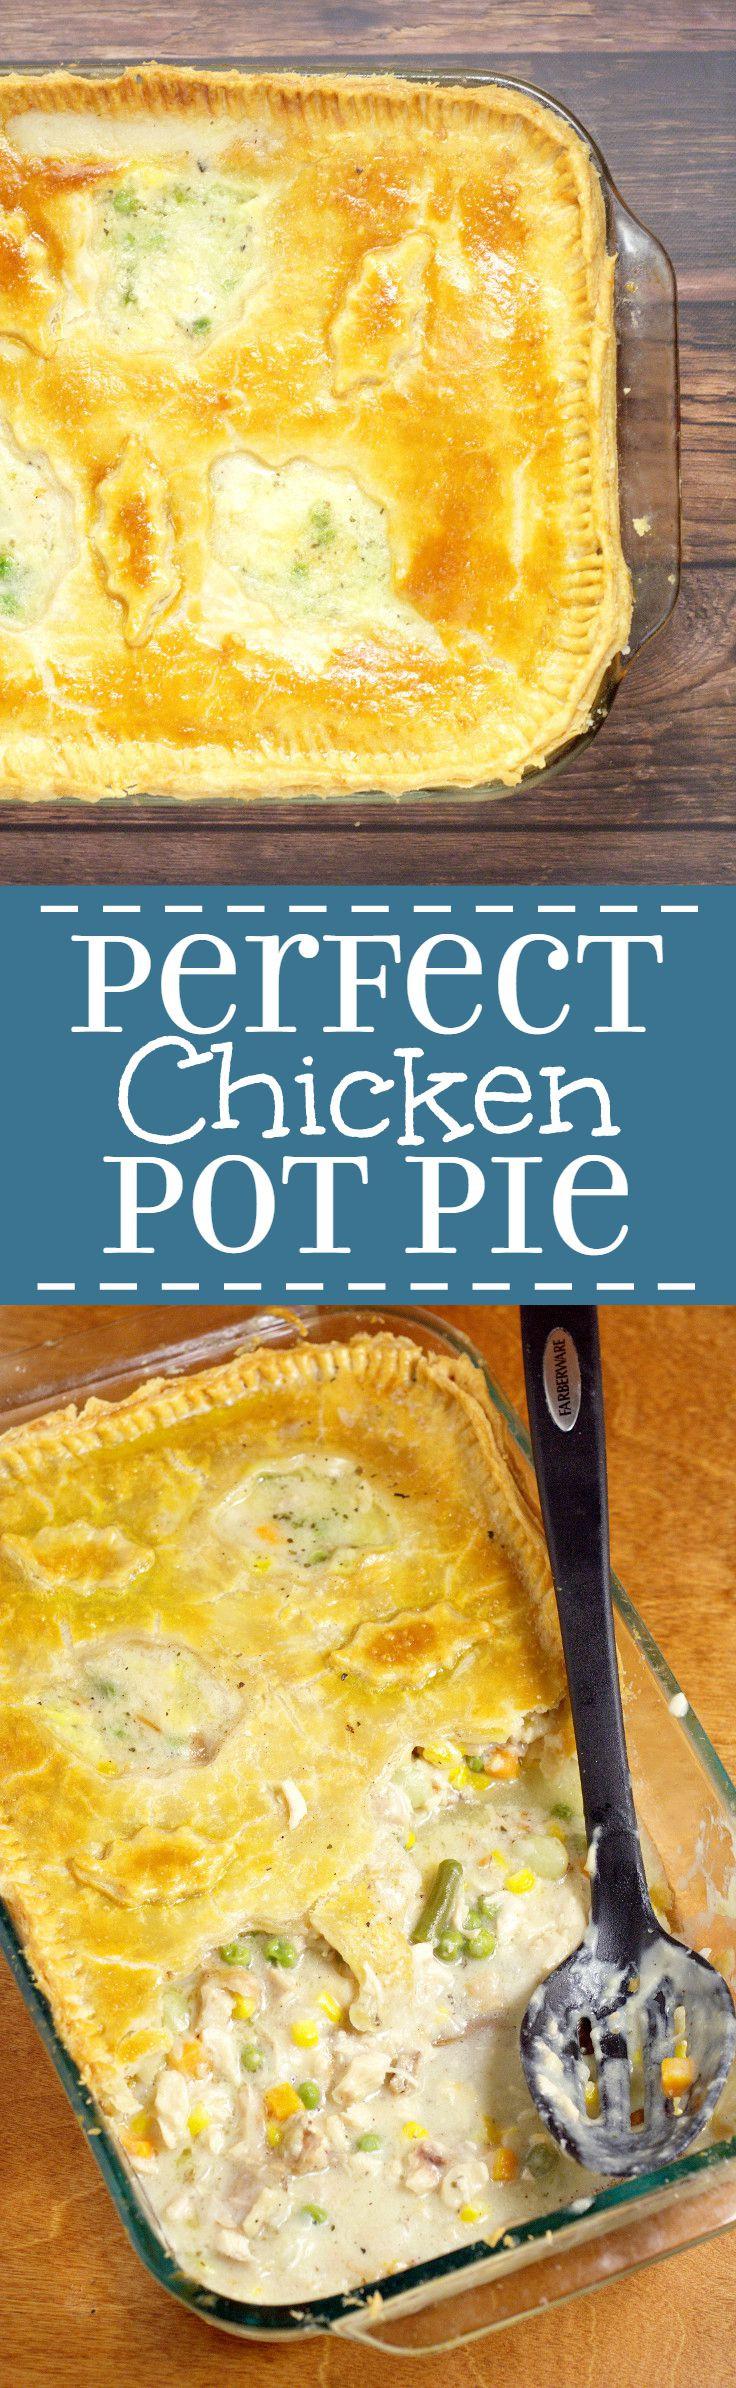 Chicken Pot Pie Casserole Recipe  Homemade Chicken Pot Pie Casserole Recipe